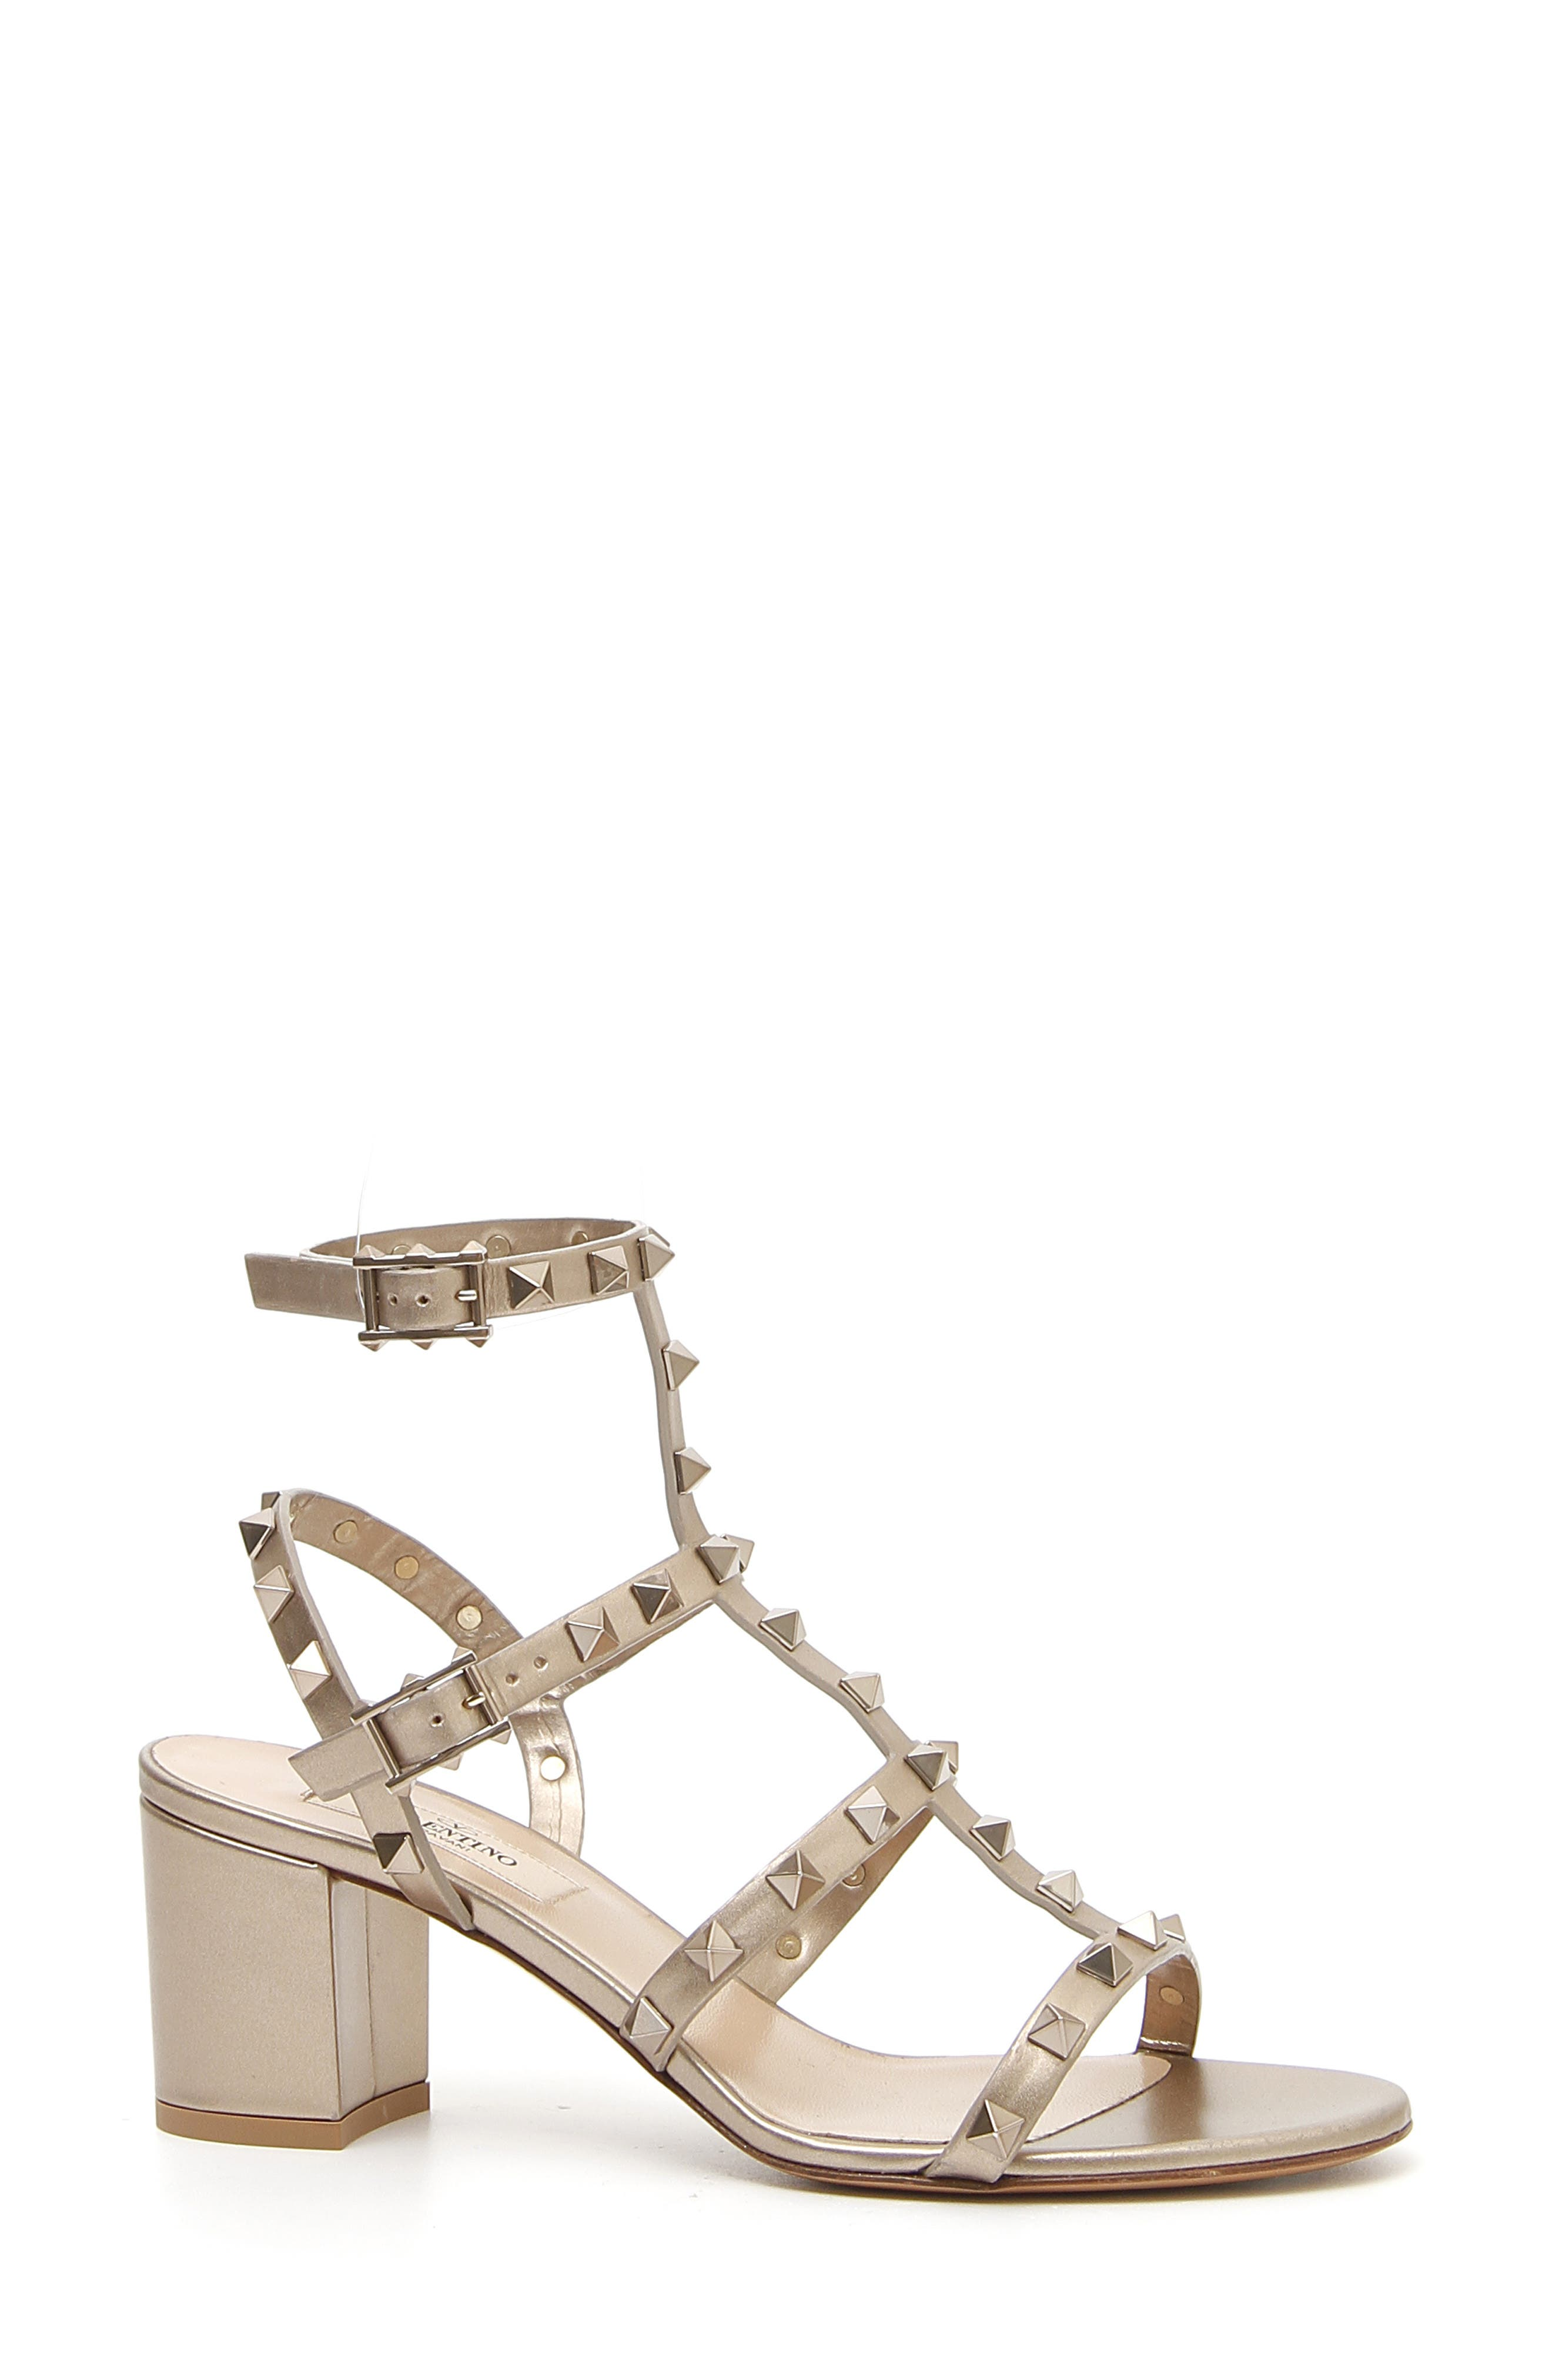 Rockstud Metallic Block Heel Sandal, Main, color, SKIN